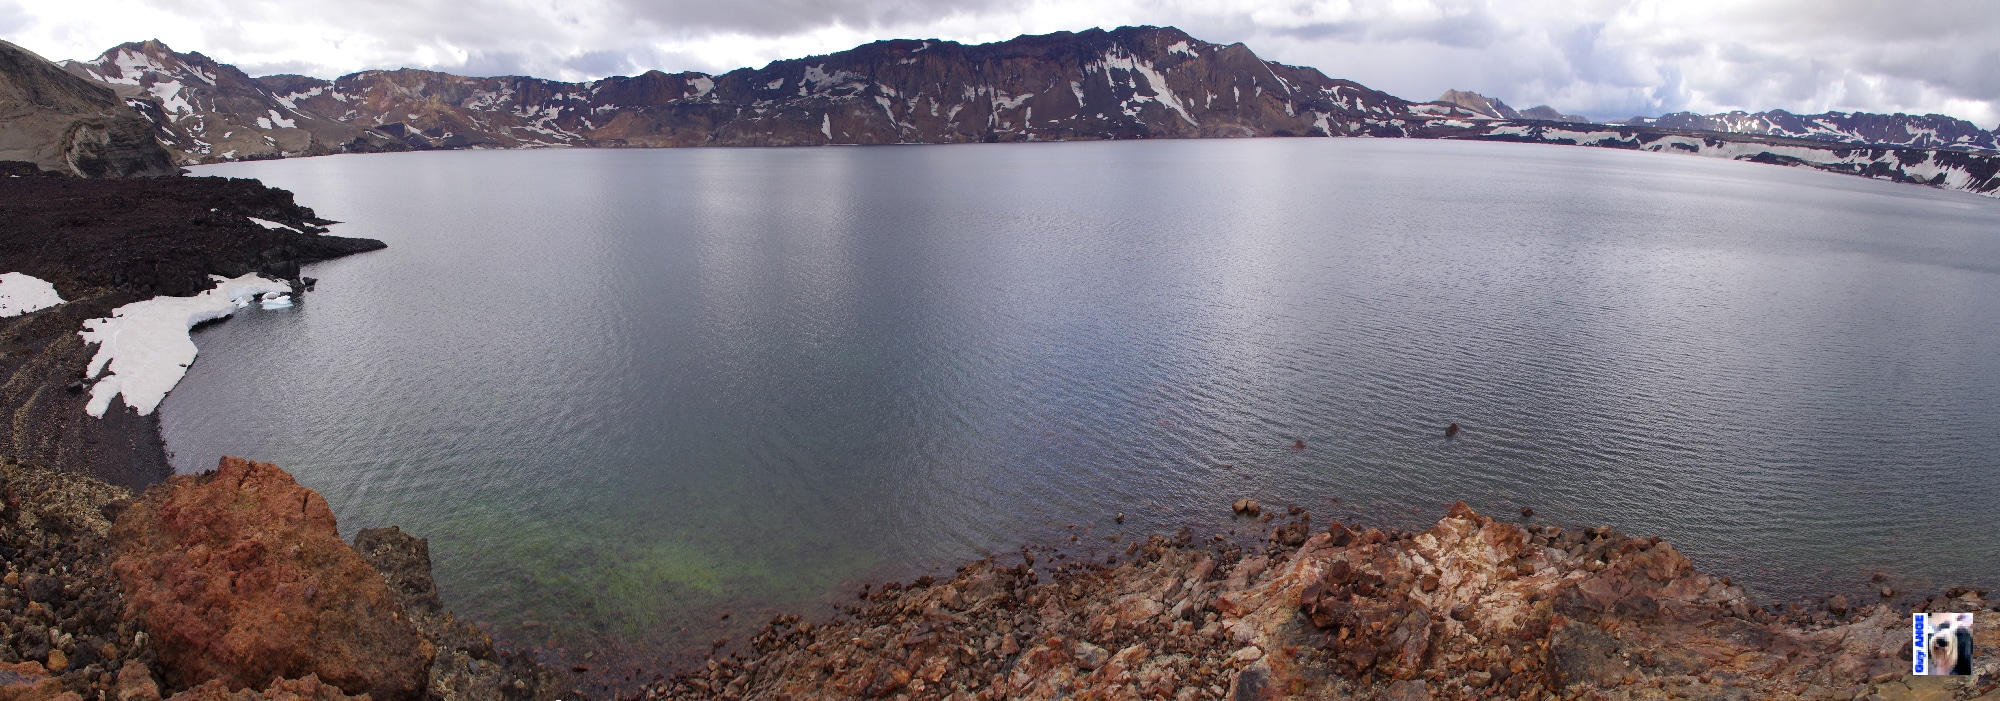 Le lac Öskjuvatna dans la caldeira d'Askja.